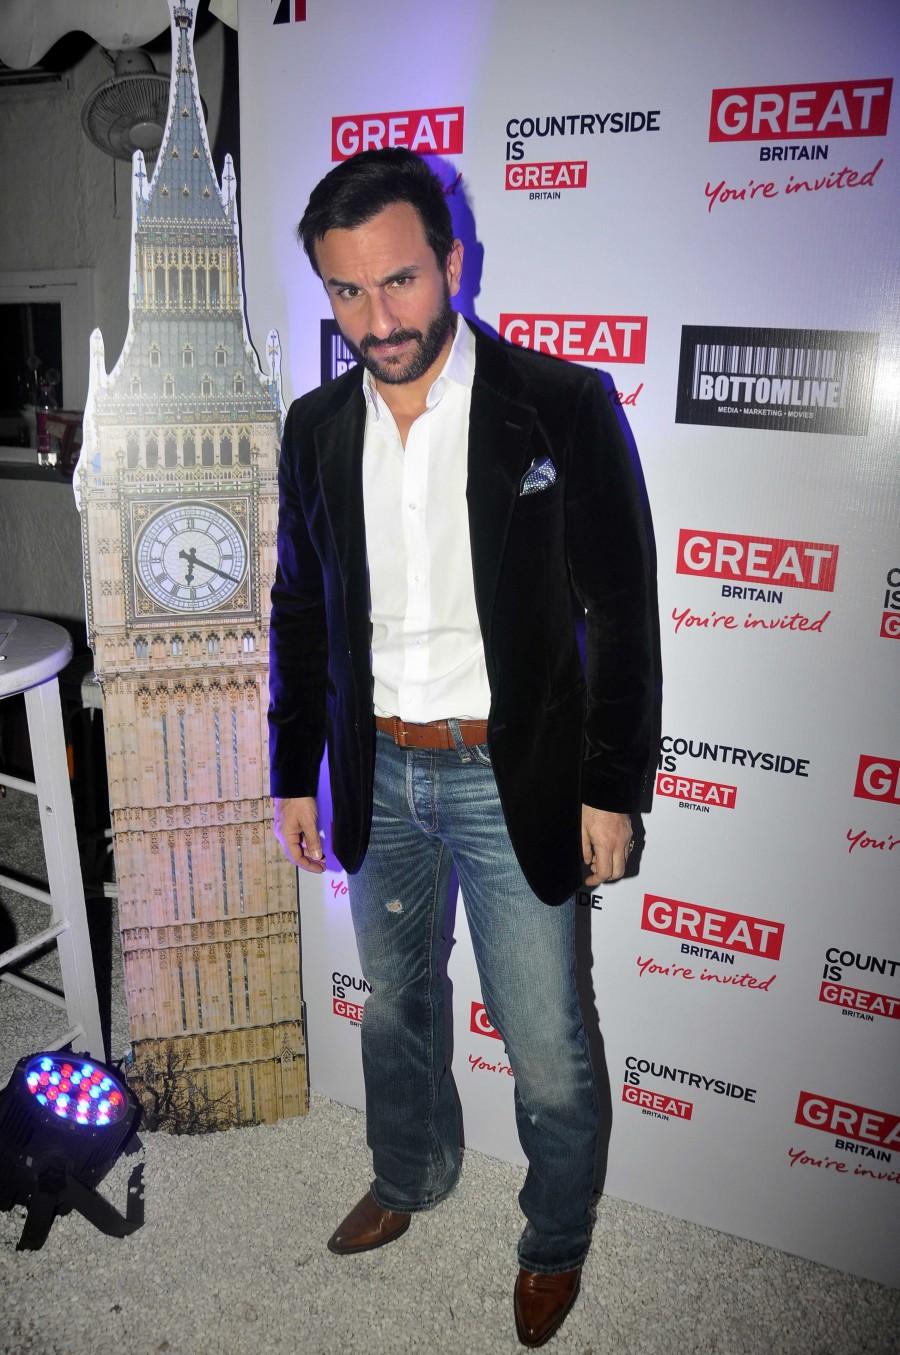 Saif Ali Khan,Rashmi Nigam,Sumathi Ramanathan,press conference,Mumbai,UK Tourism,photos